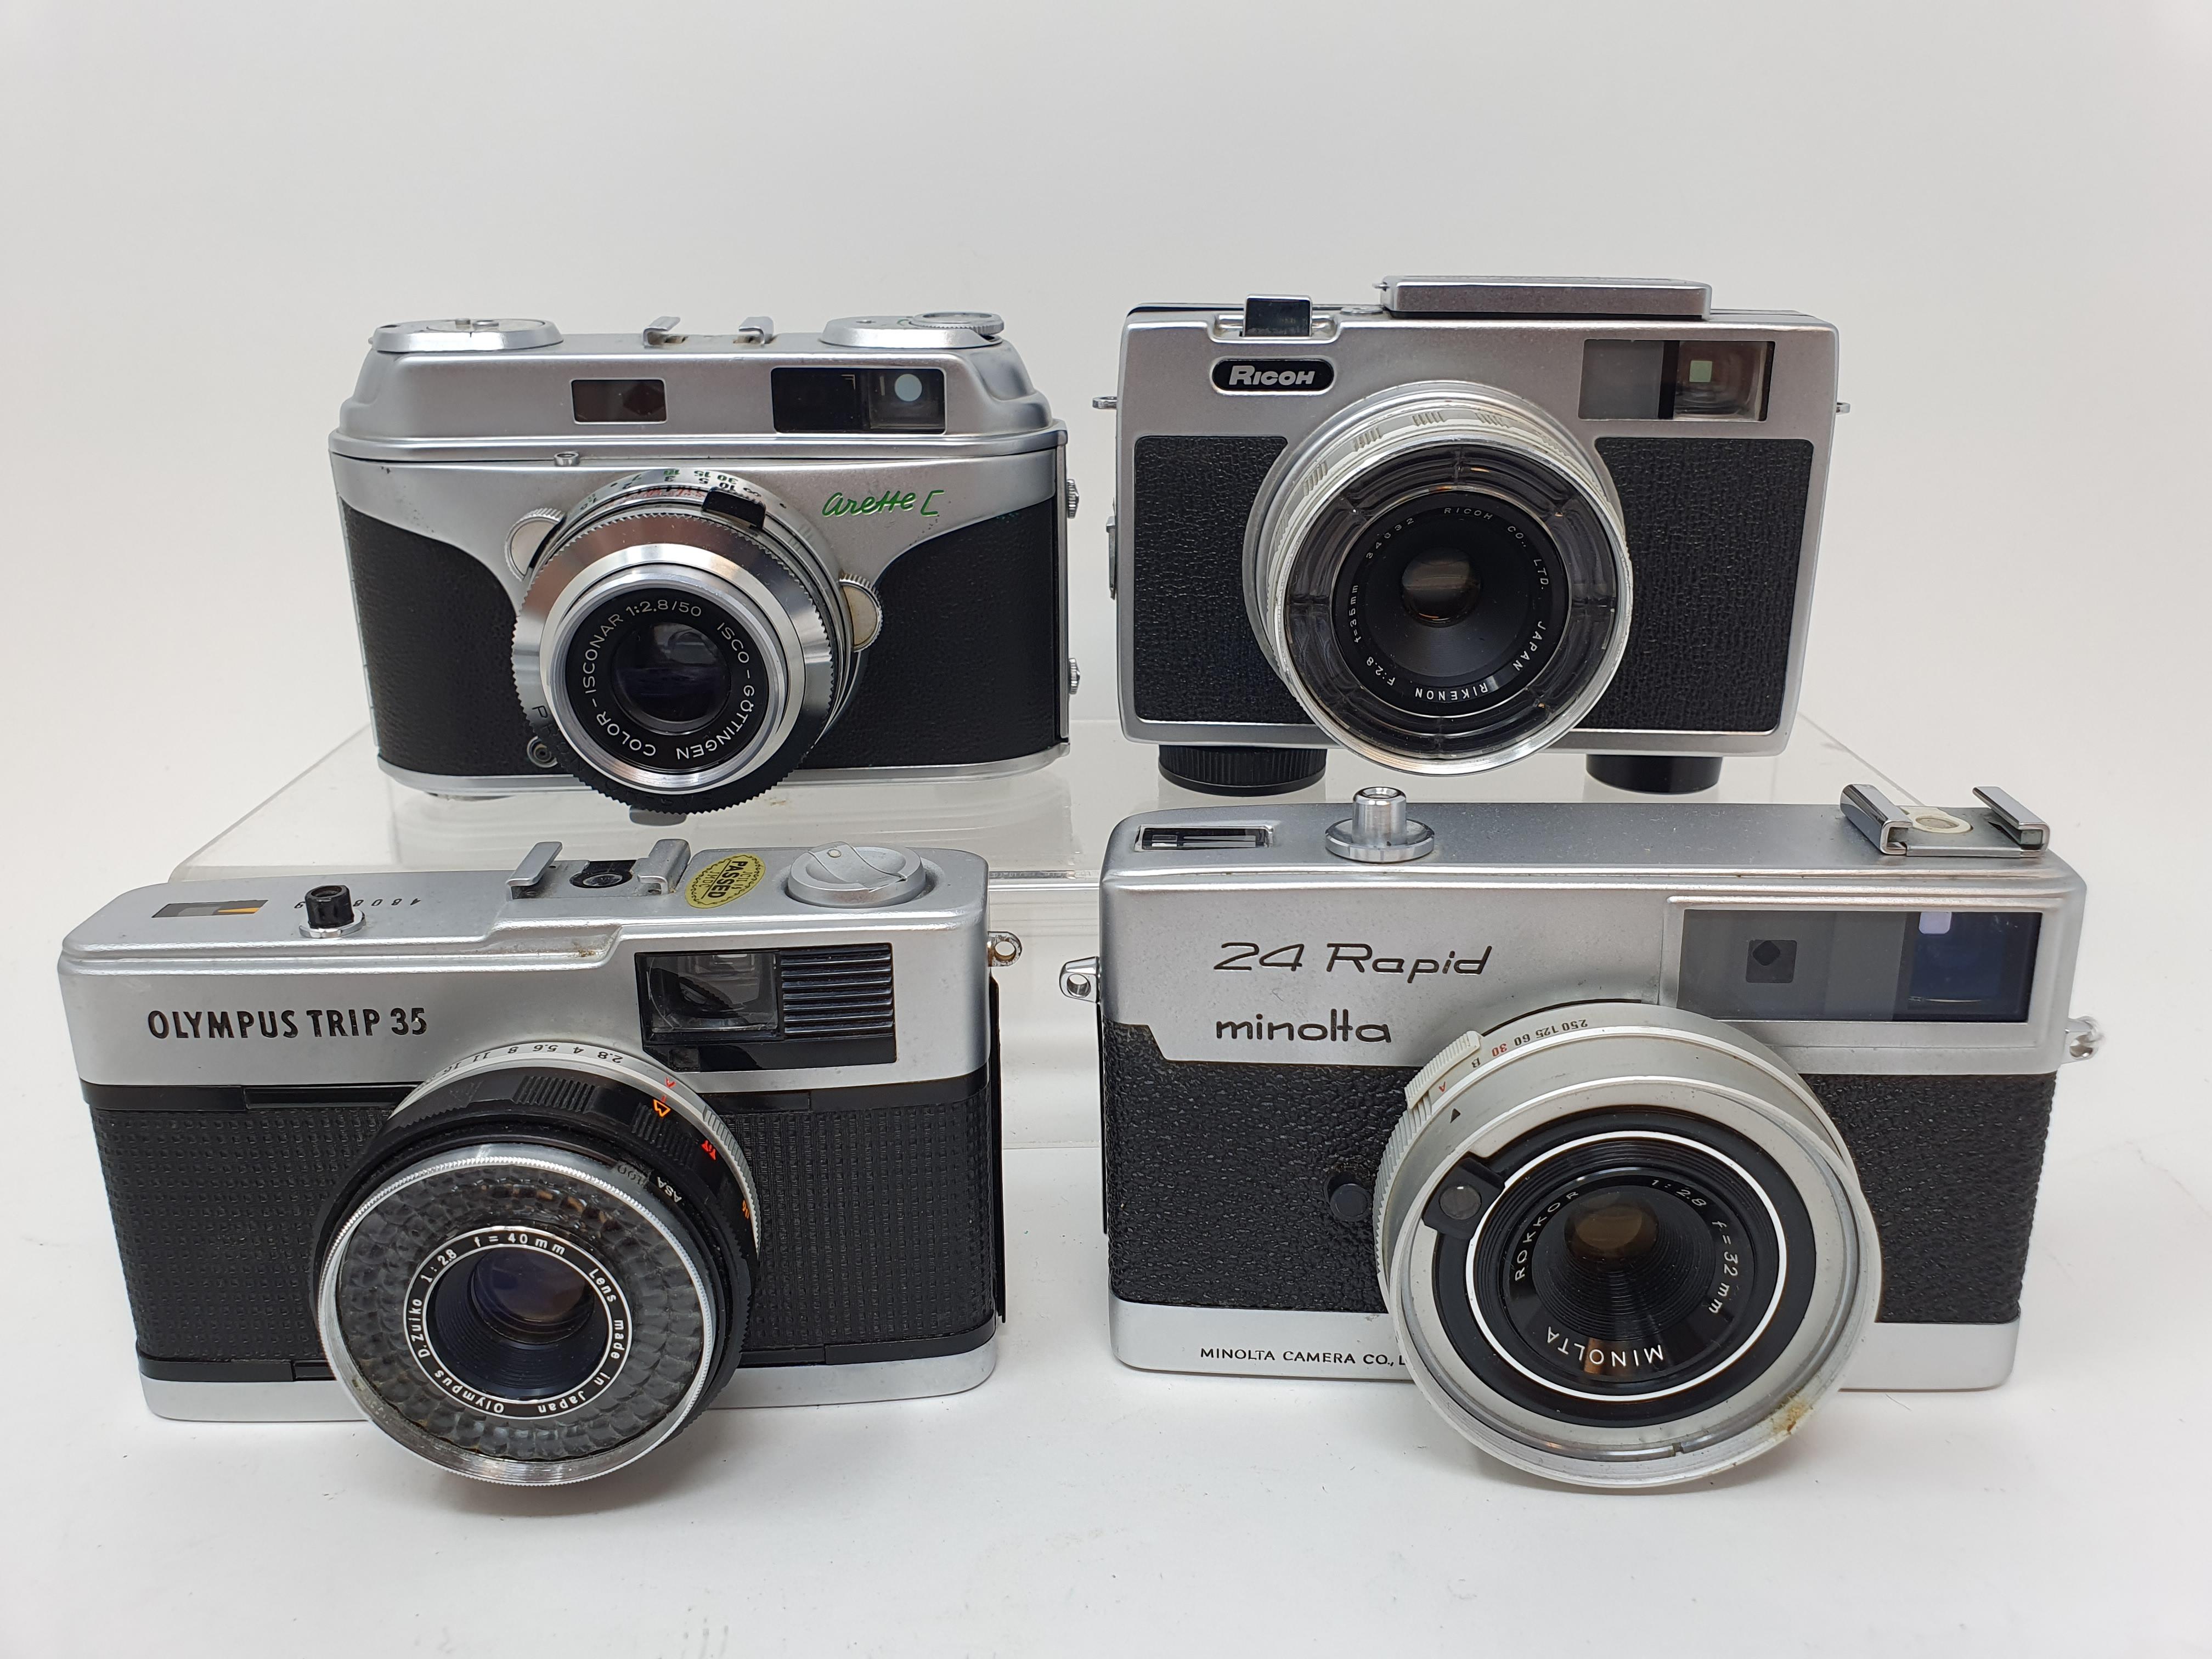 A Minolta 24 Rapid camera, an Arette C camera, a Ricoh Auto 126 camera, and an Olympus Trip 35